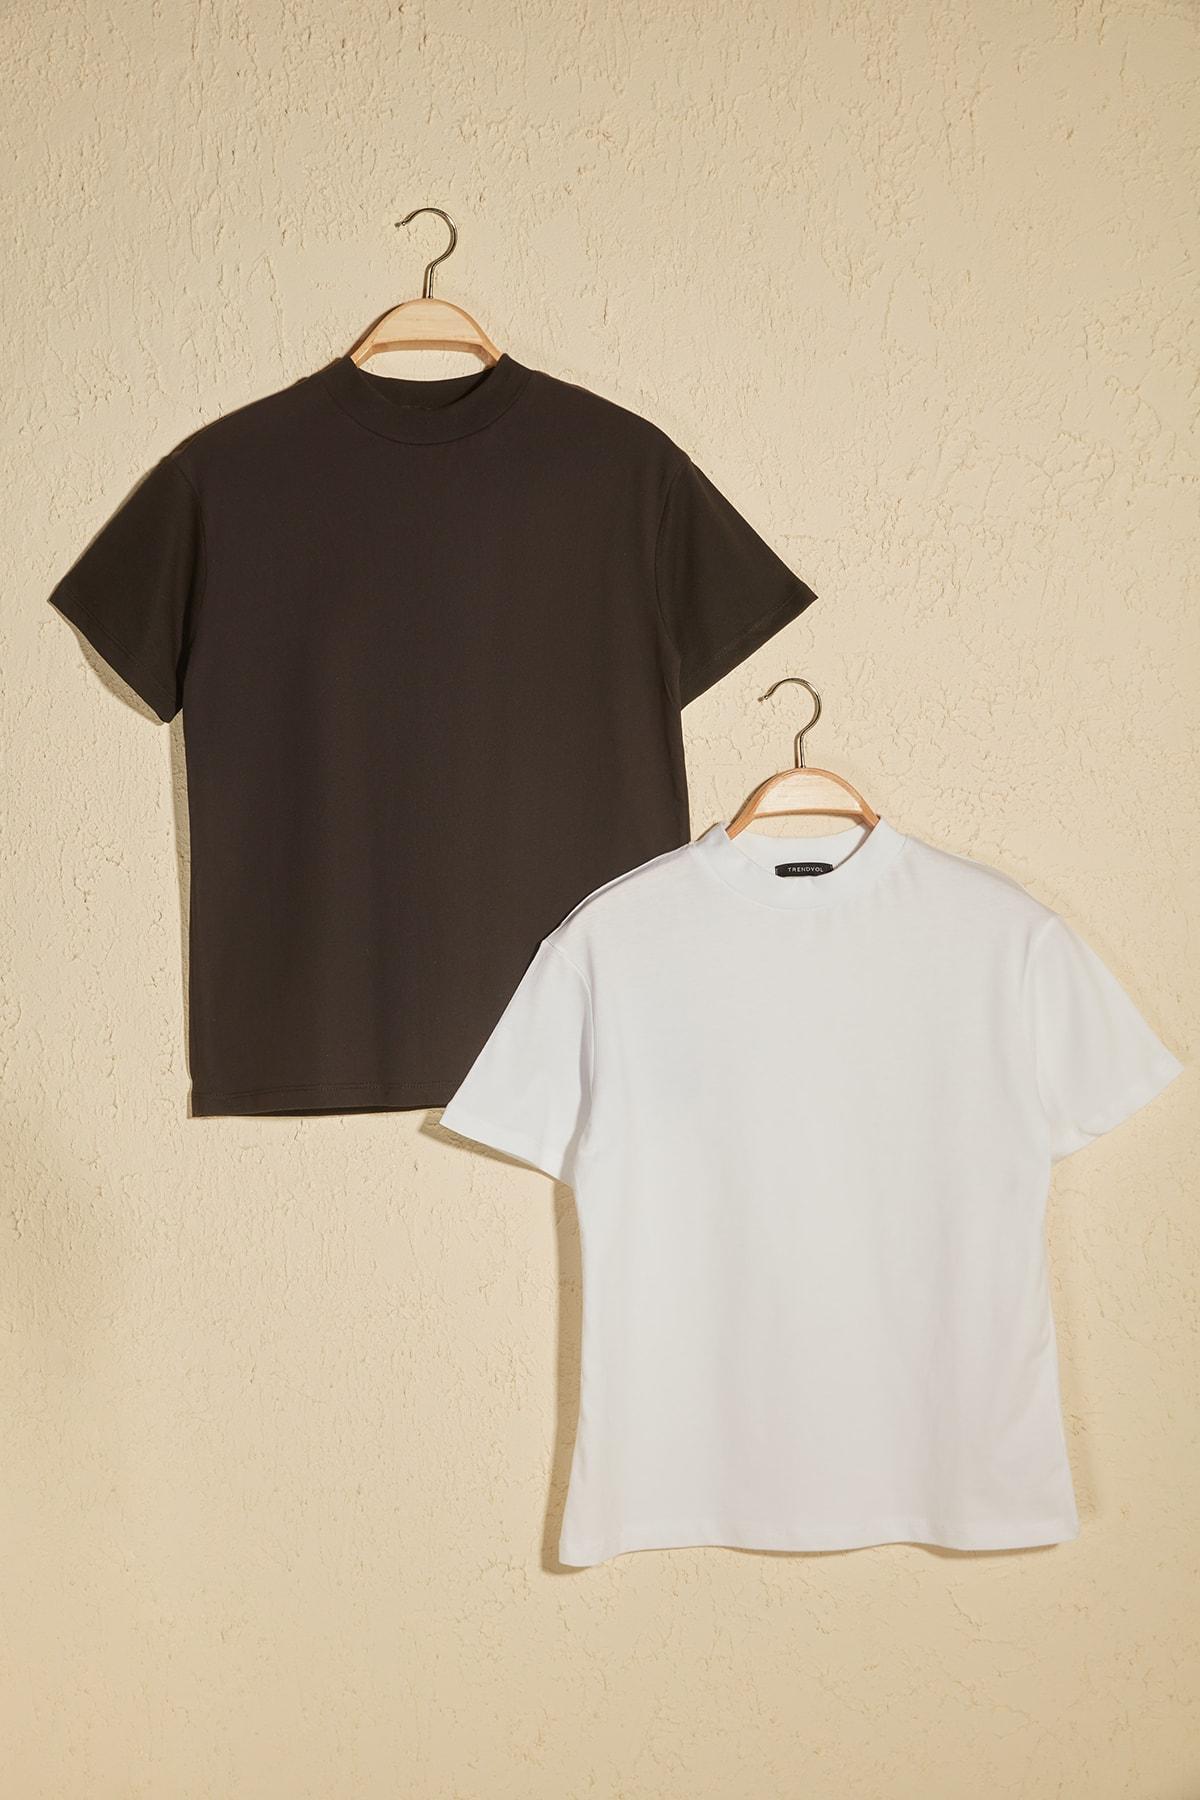 TRENDYOLMİLLA Beyaz ve Siyah Dik Yaka 2'li Paket Basic Örme Tshirt T-Shirt TWOSS20TS1500 1